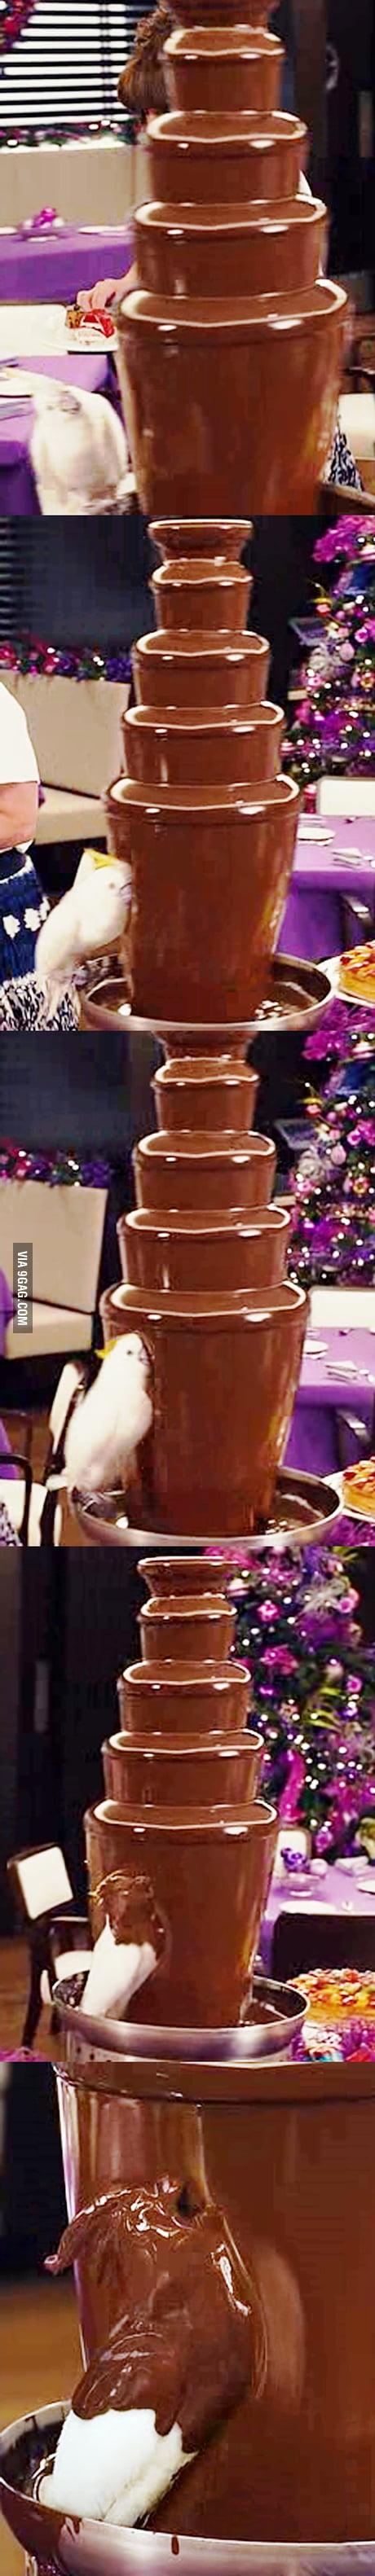 Chocolate addiction lvl : Parrot